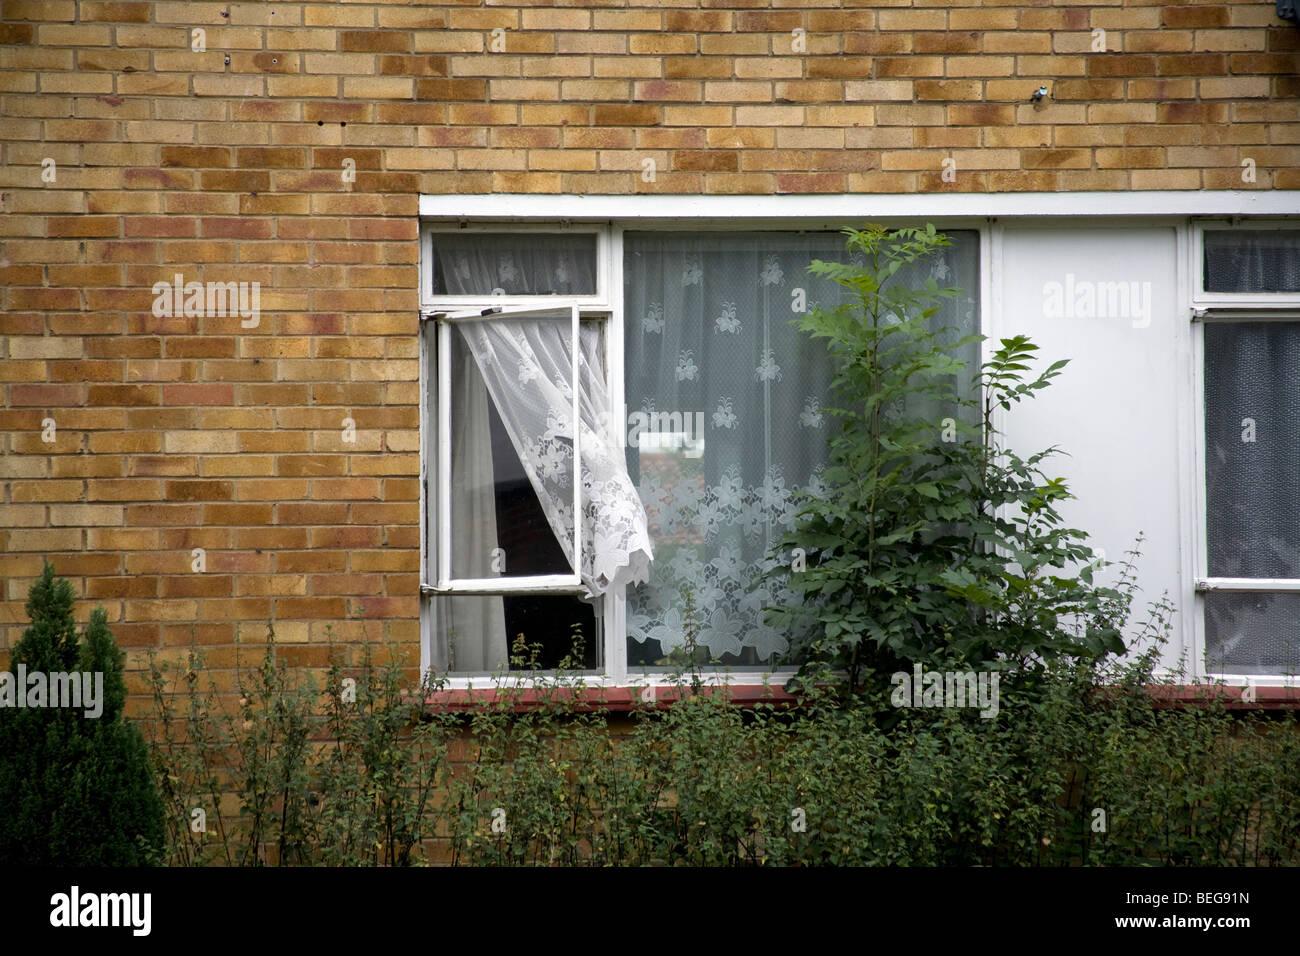 burglary photos burglary images alamy. Black Bedroom Furniture Sets. Home Design Ideas